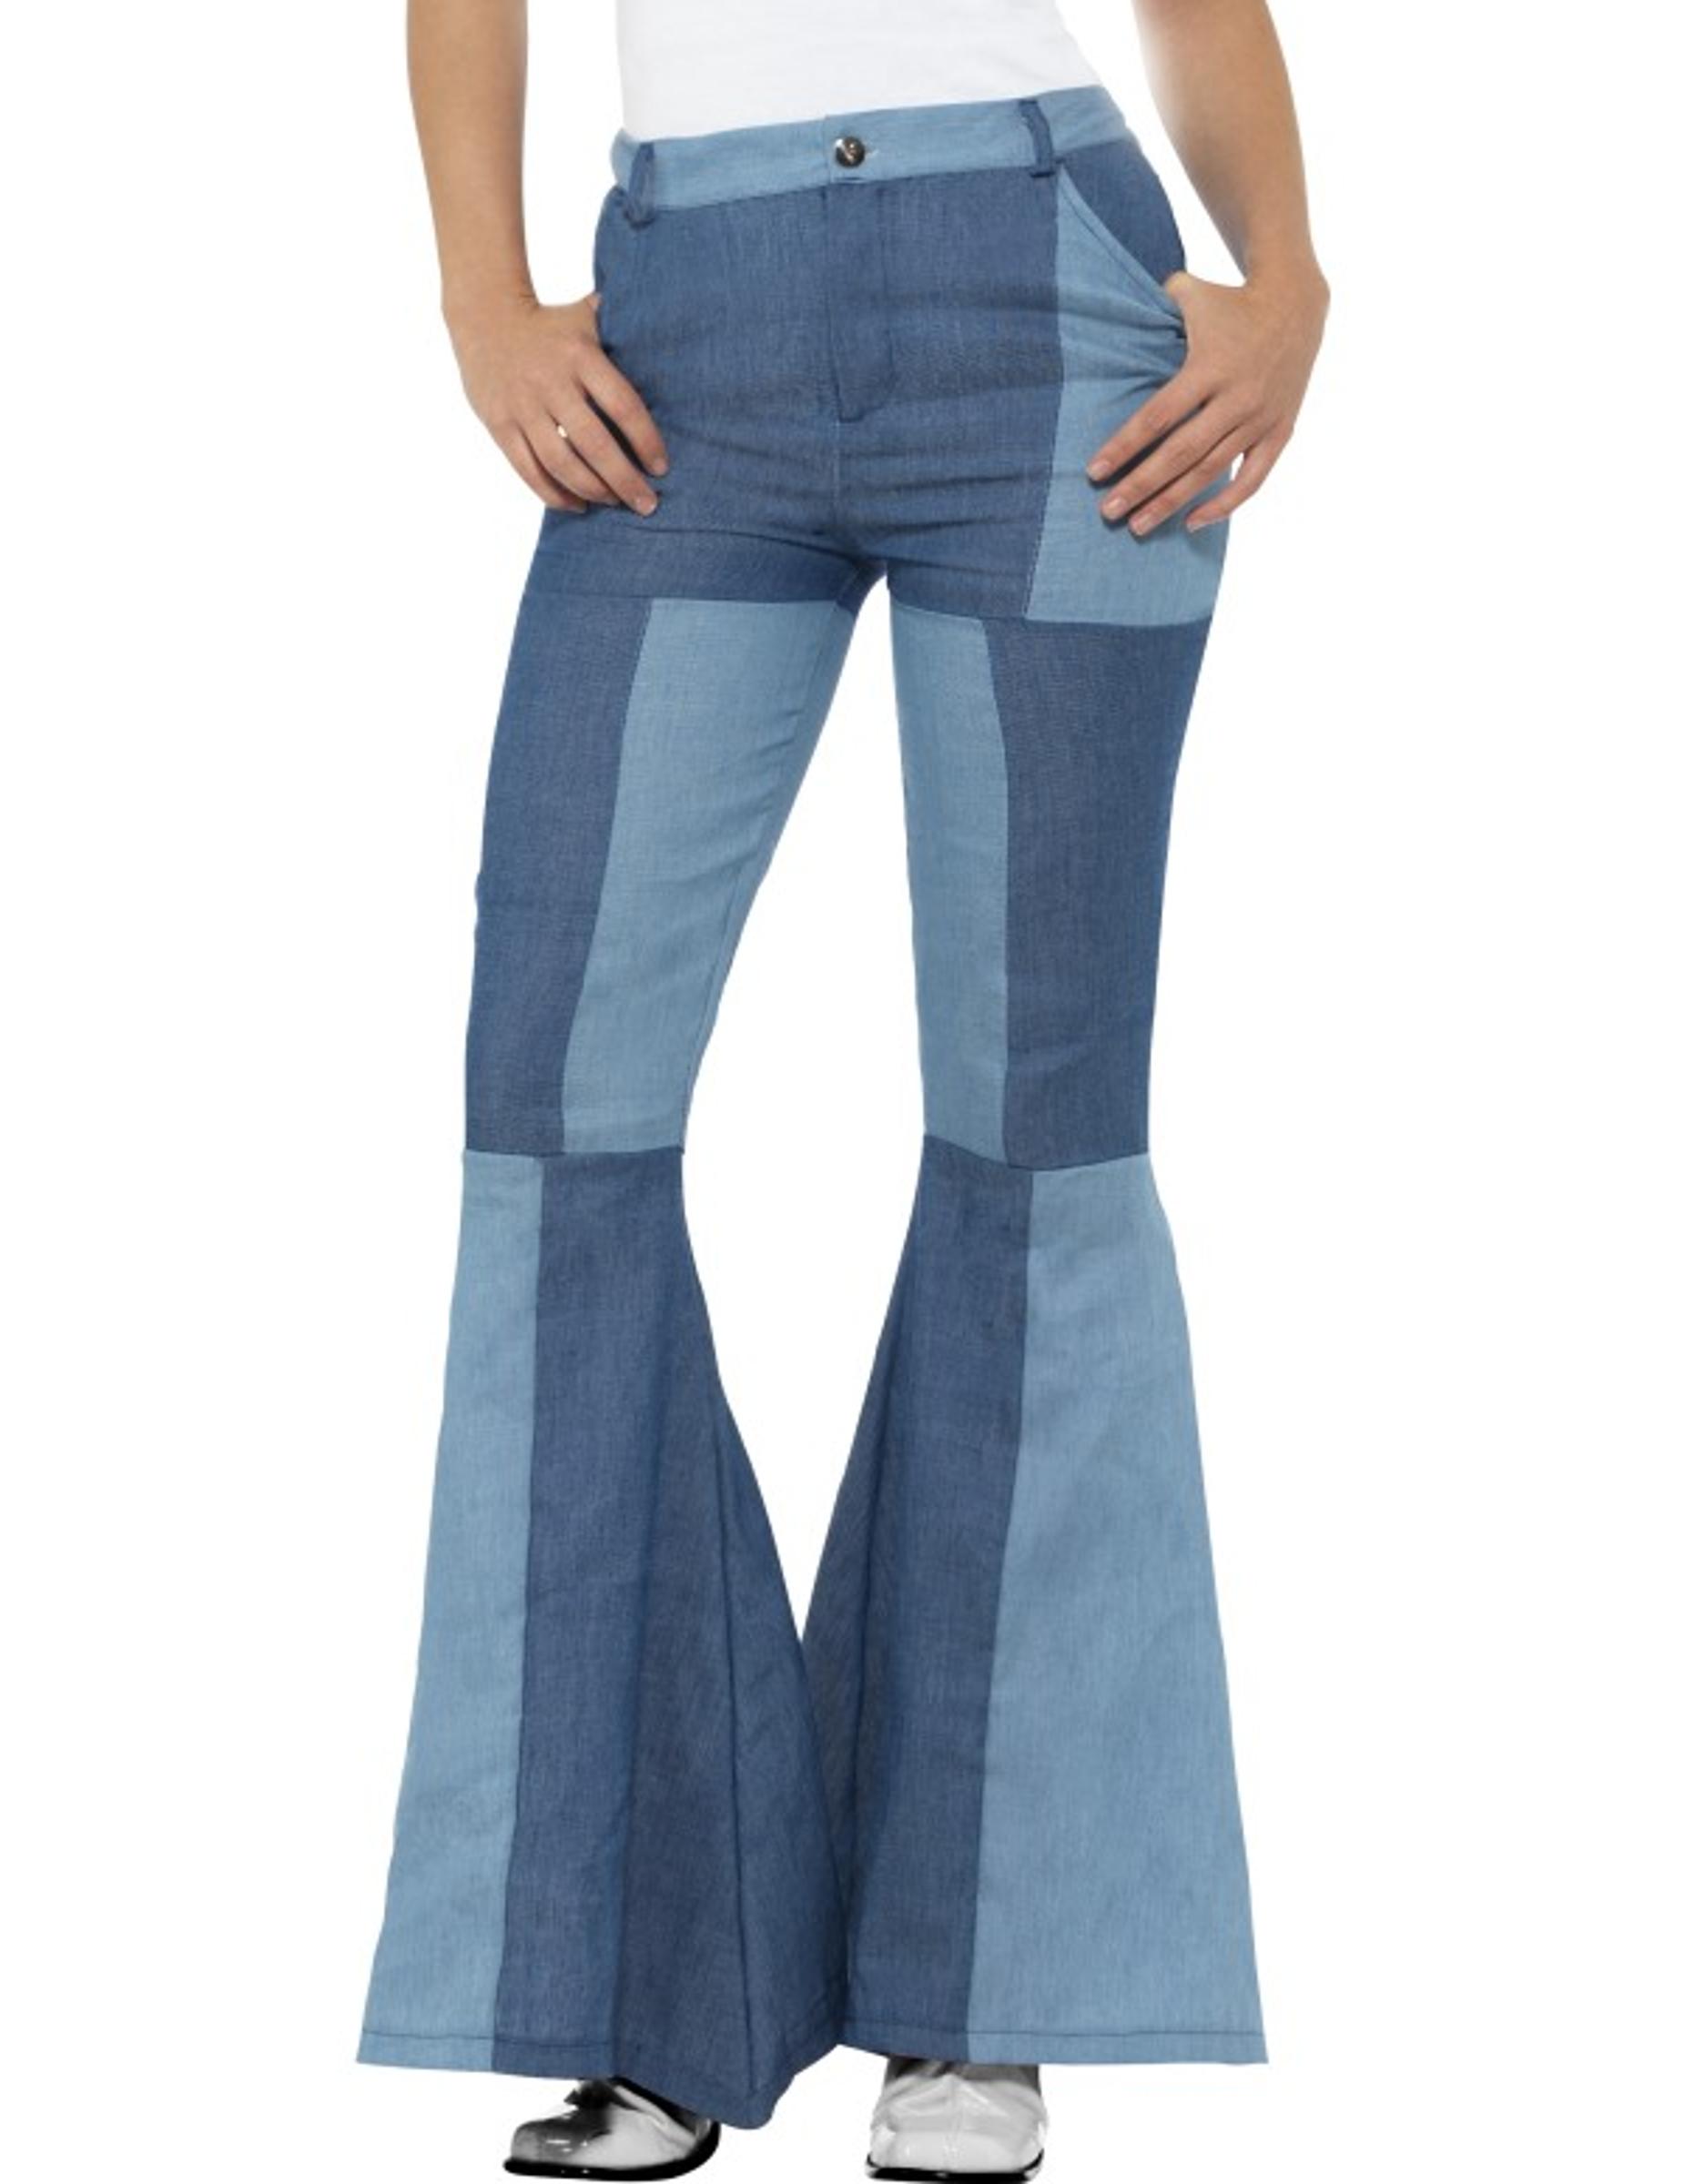 Pantaloni jeans patchwork per donna  Costumi adulti 467a8dbc440